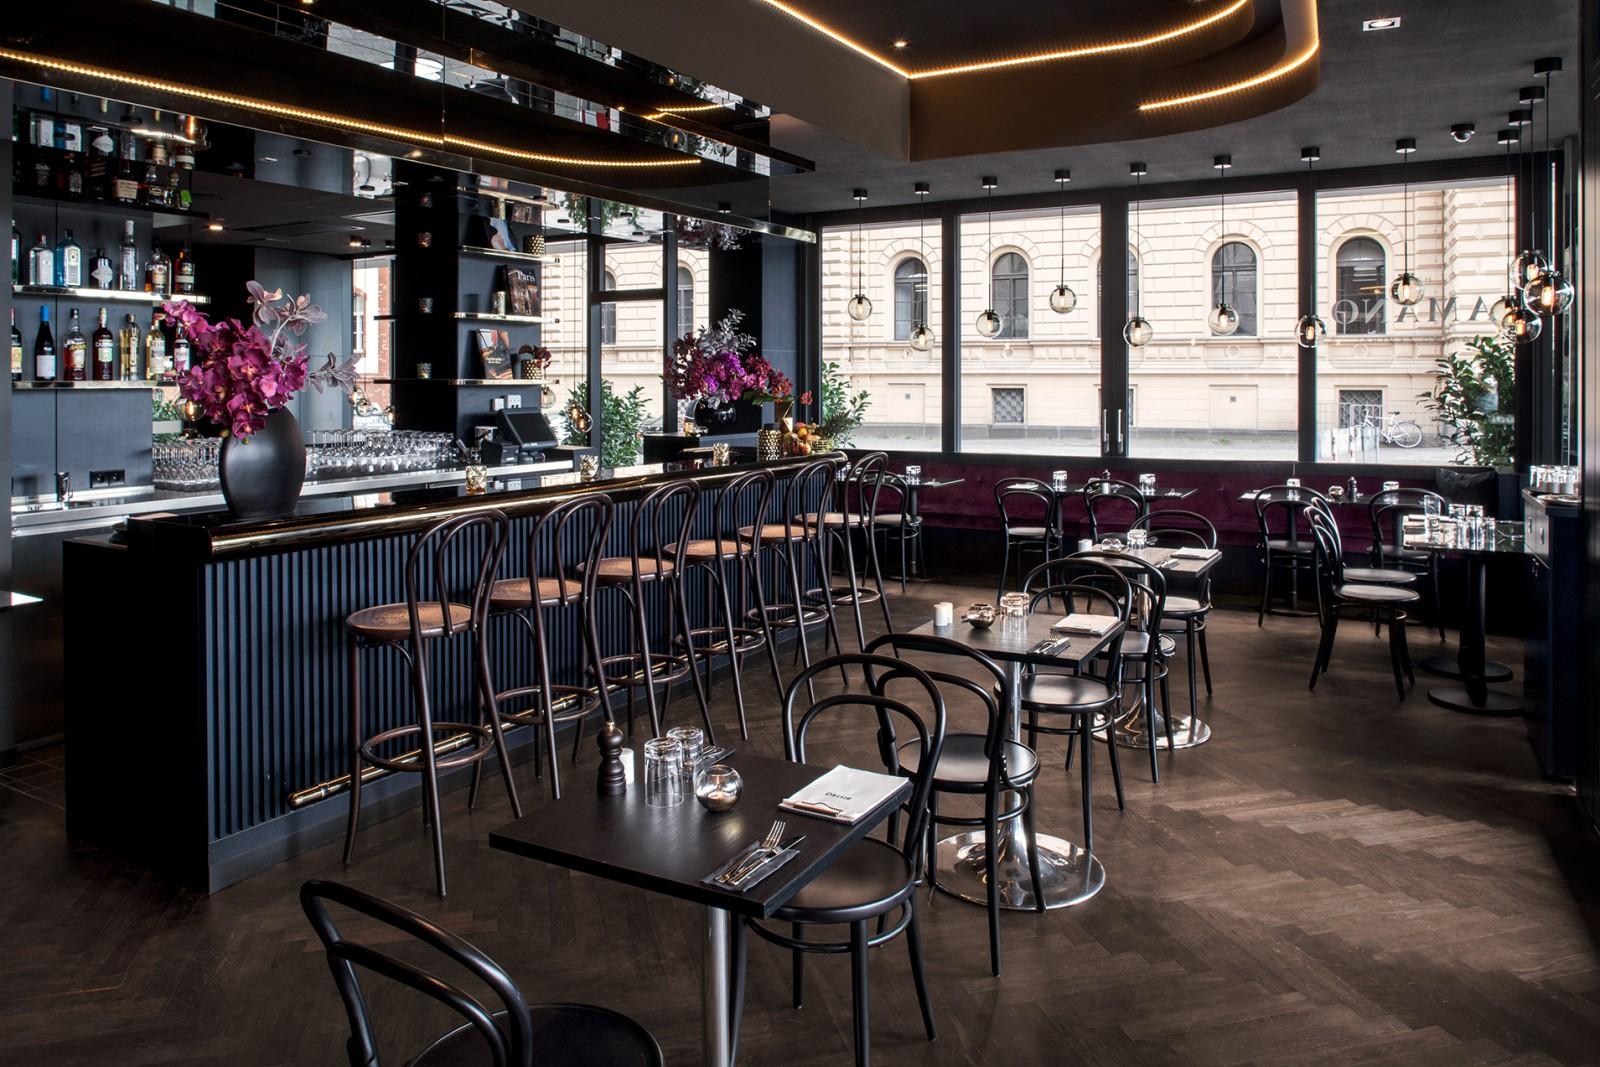 restaurant bistro in berlin. Black Bedroom Furniture Sets. Home Design Ideas